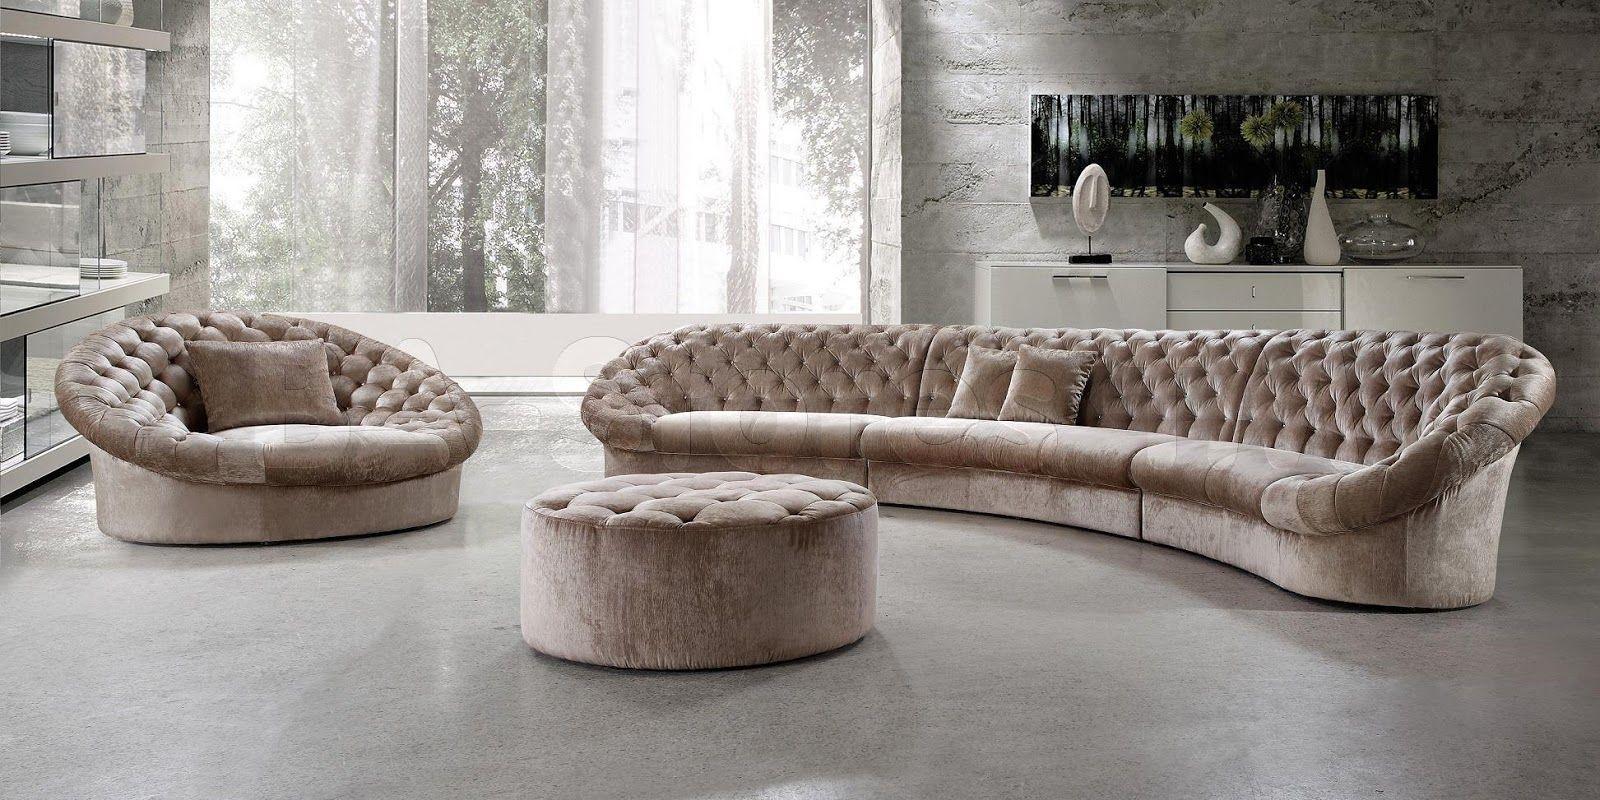 Circle Sofa Of Sofa Sets On Pinterest Sofa Set Leather Sofa Set And Modern  Sofa